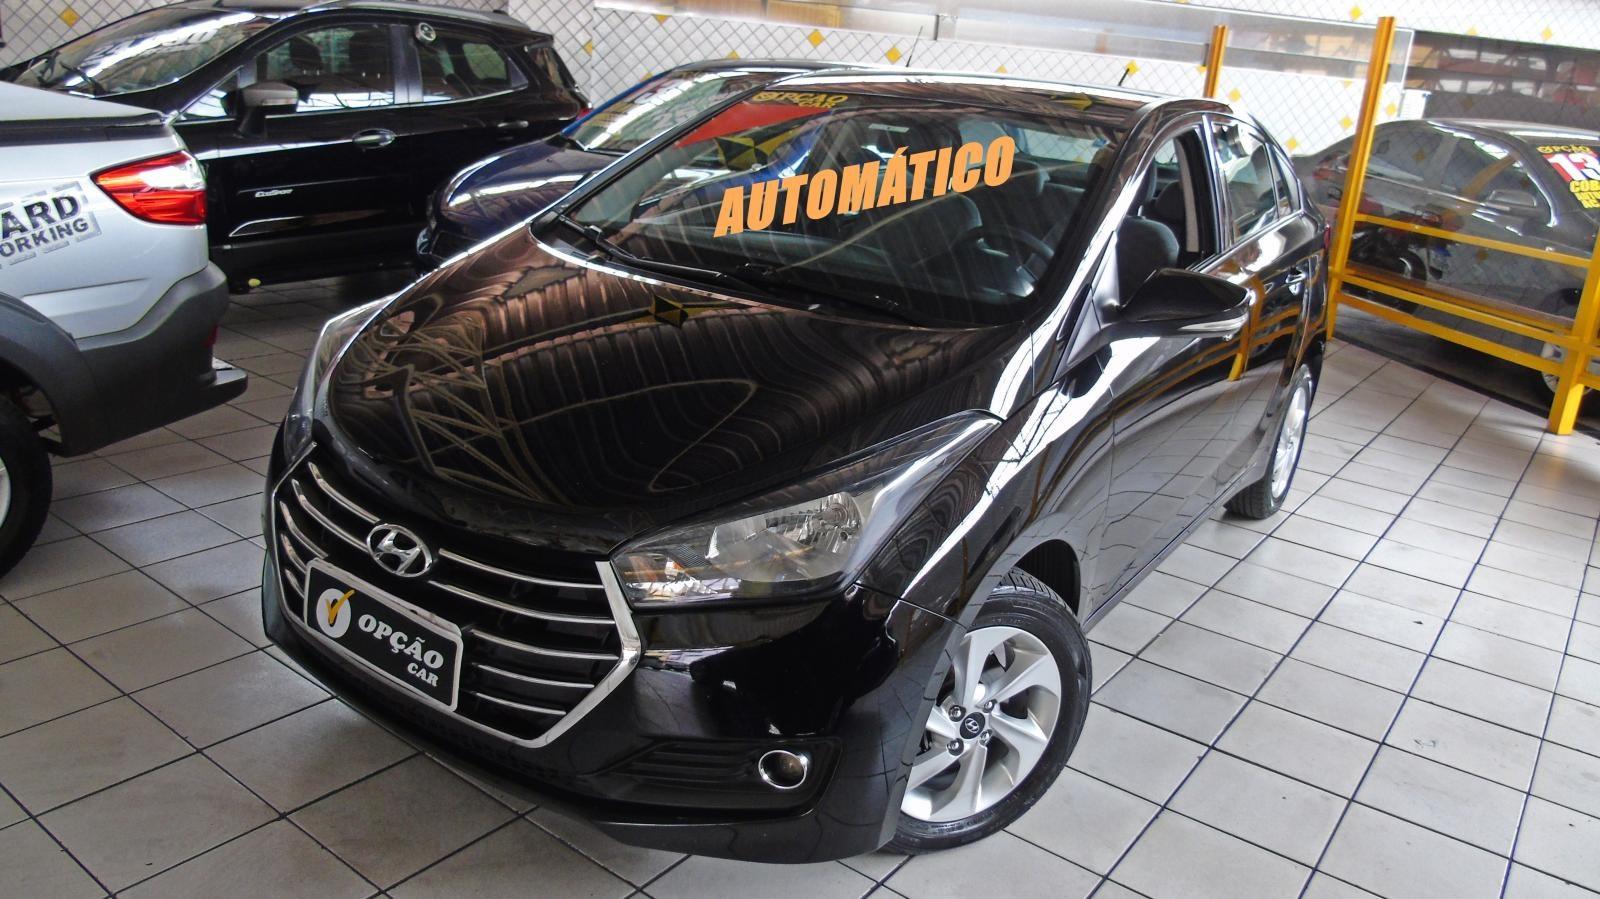 //www.autoline.com.br/carro/hyundai/hb20s-16-comfort-style-16v-flex-4p-automatico/2017/sao-paulo-sp/13195691